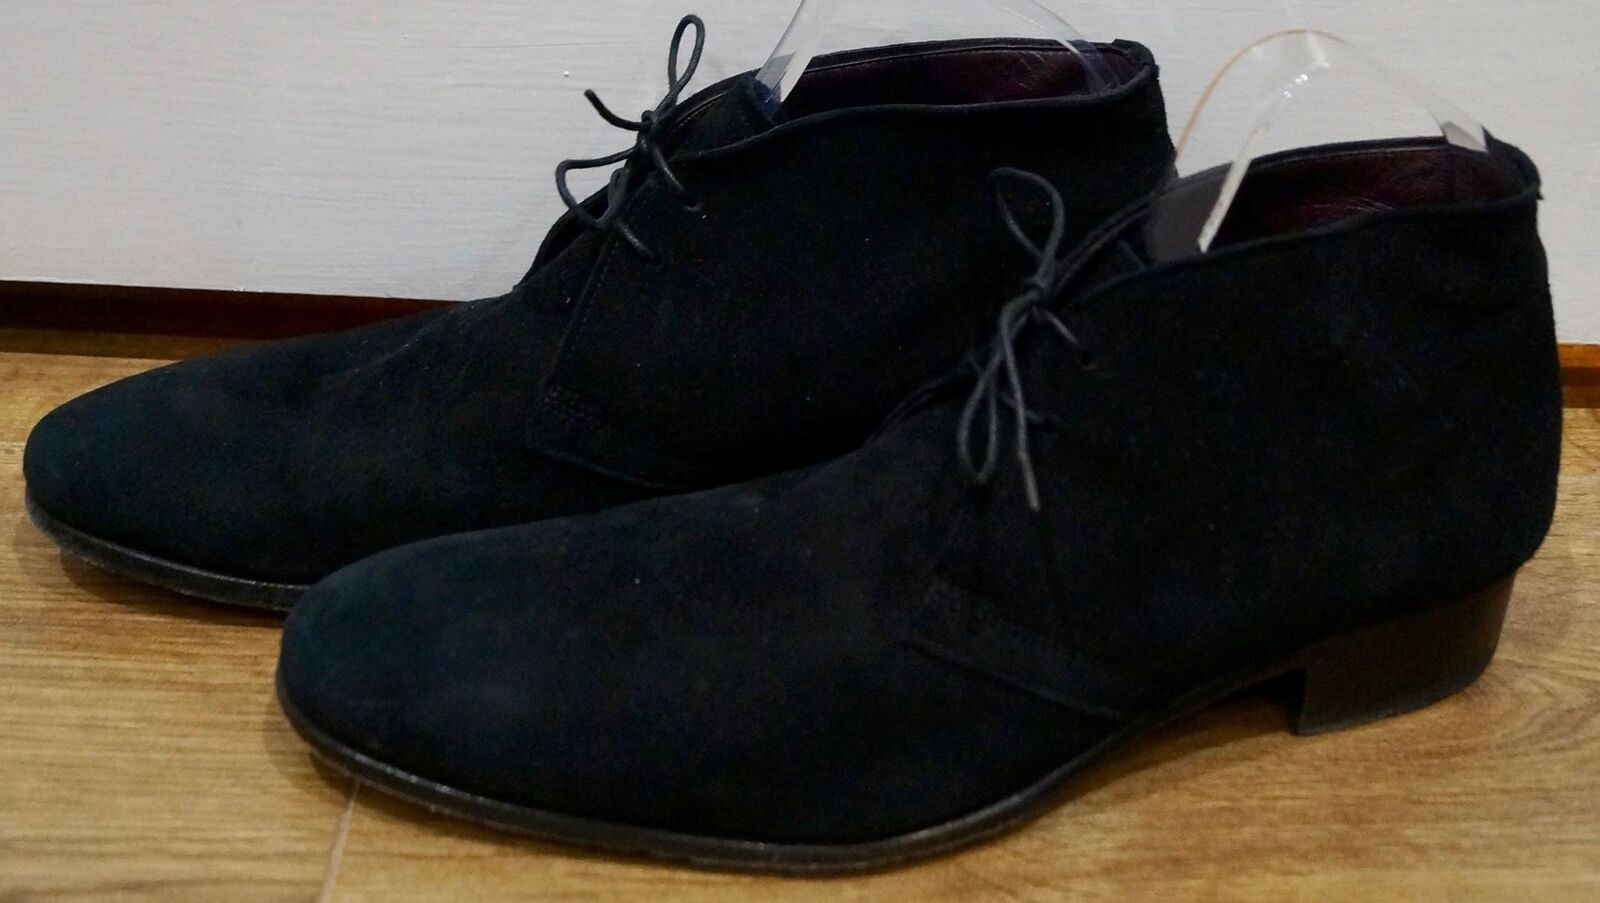 LIDFORT MADE IN ITALY Menswear Neri in Pelle Scarpe Scamosciata Alto Top Lacci Scarpe Pelle Casual UK8 0694fe